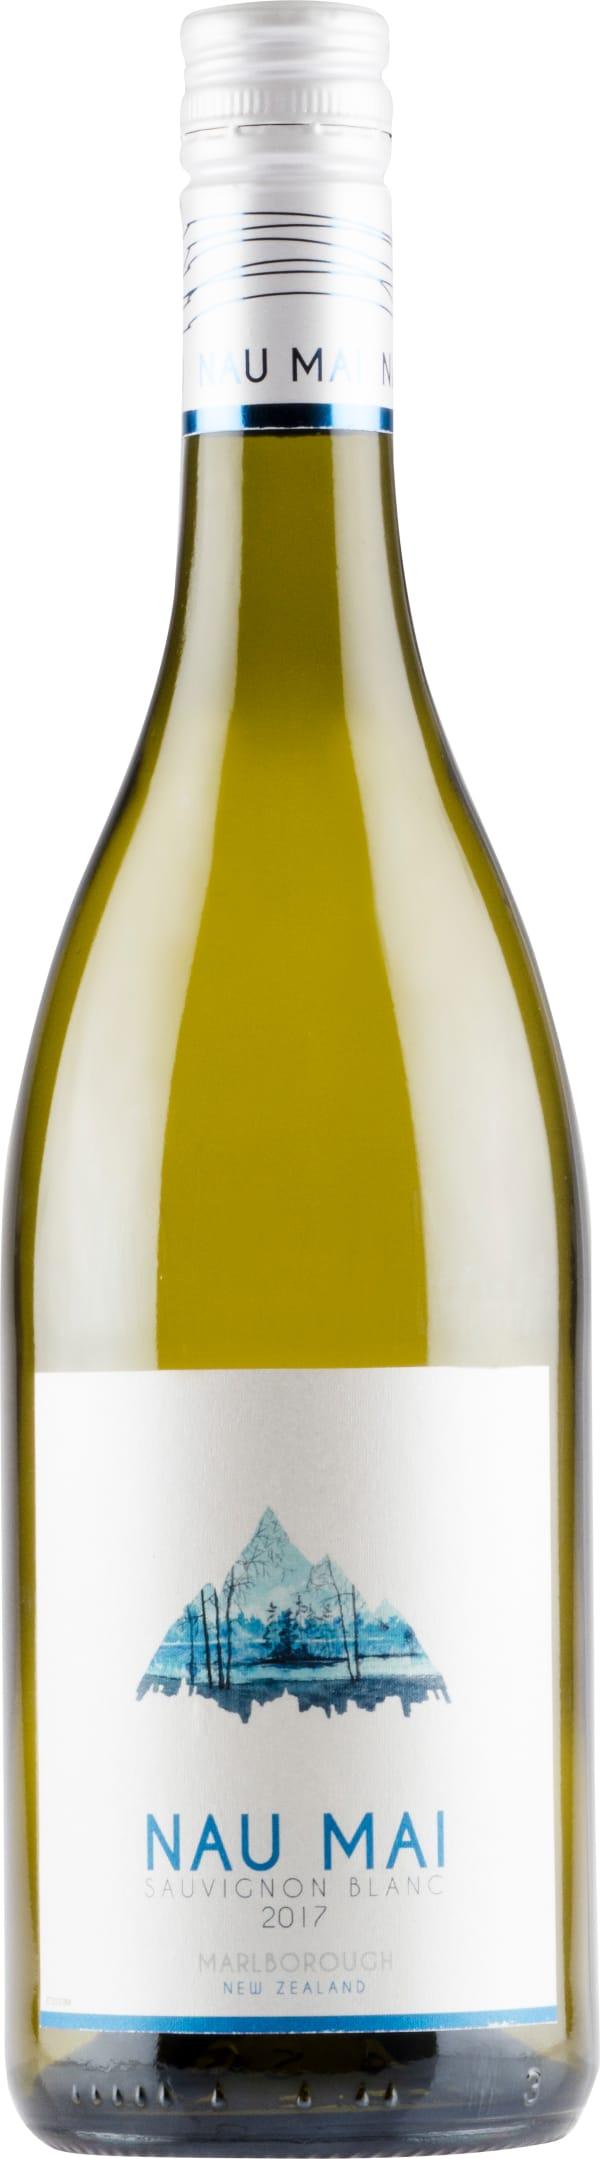 Nau Mai Sauvignon Blanc 2017